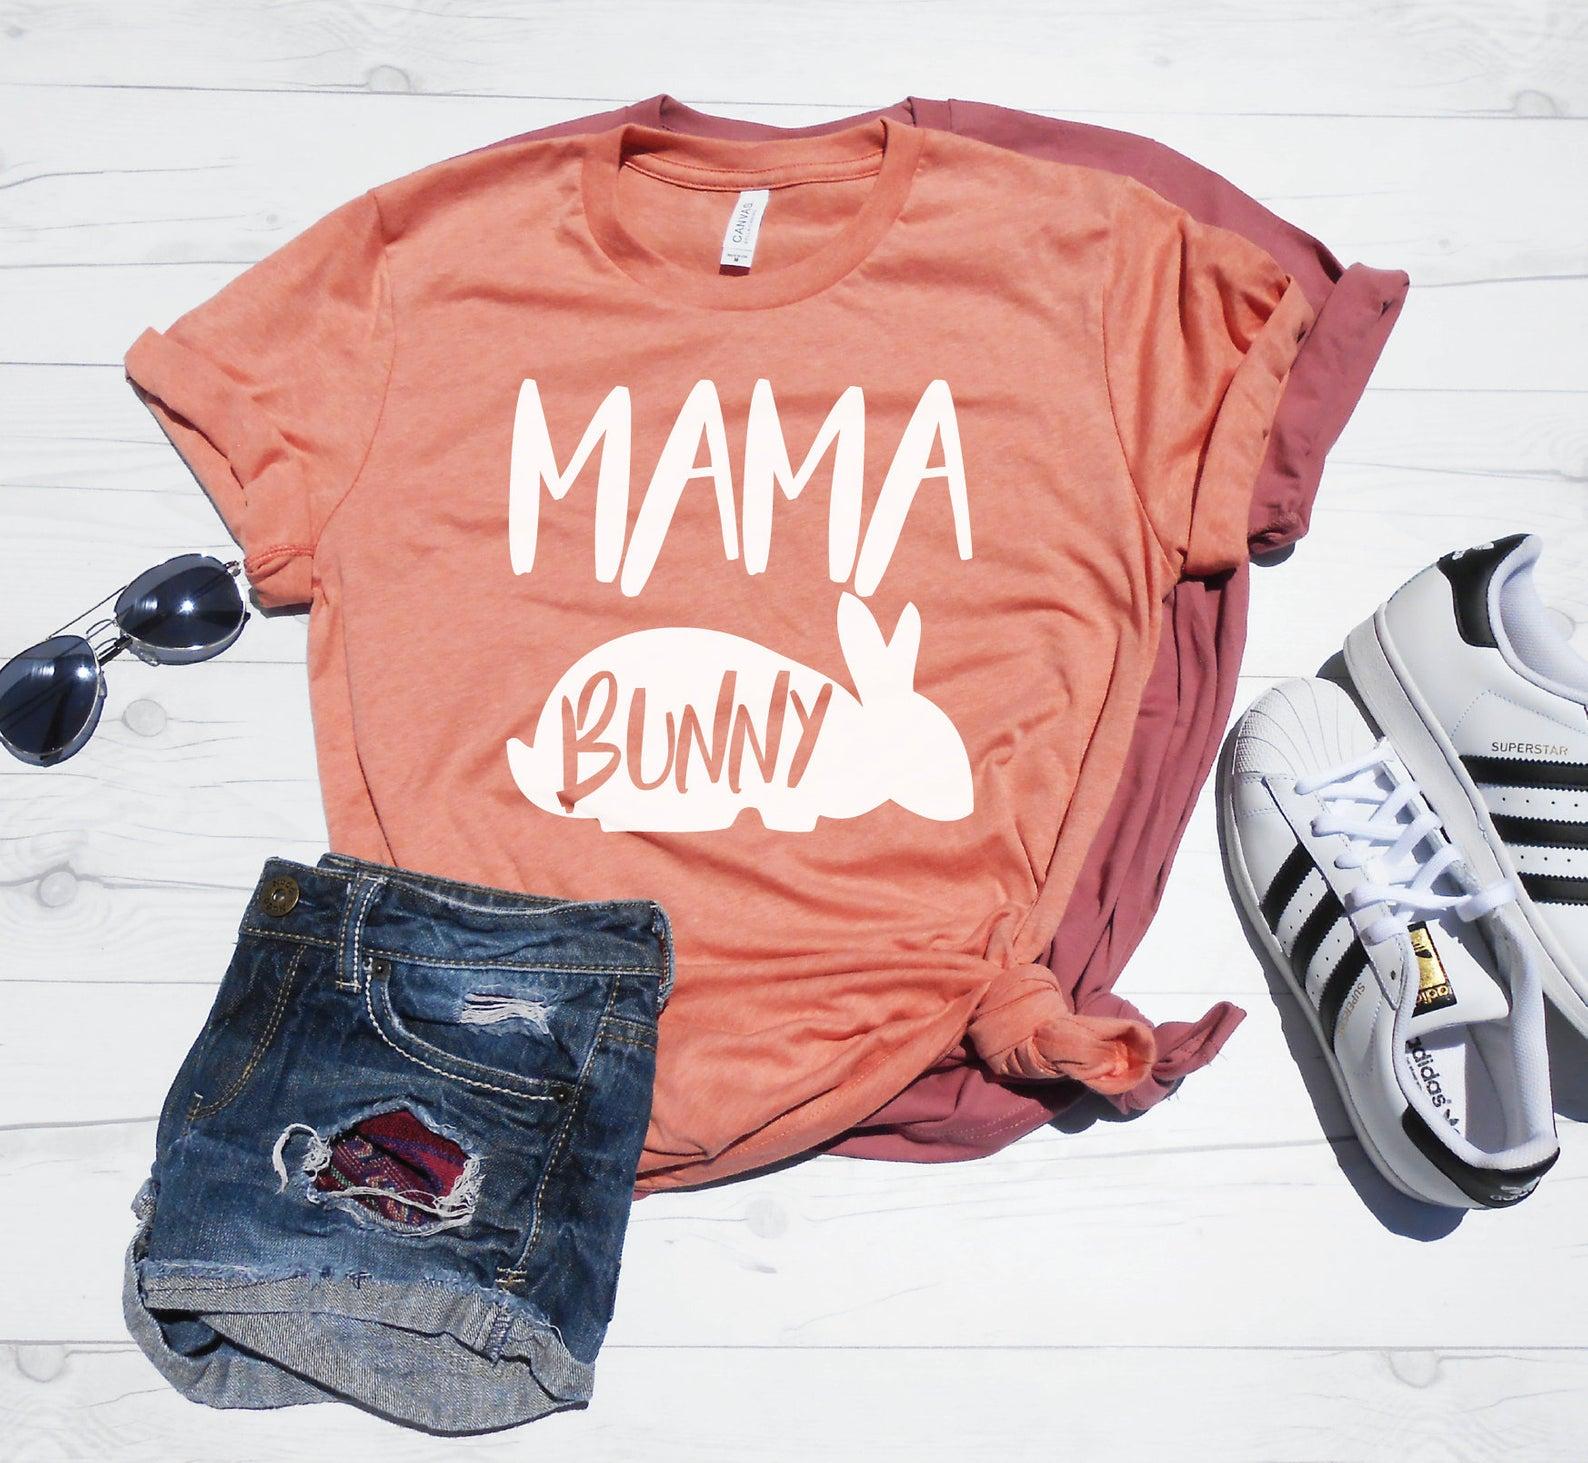 Mama Bunny Shirt By Momaste Clothing